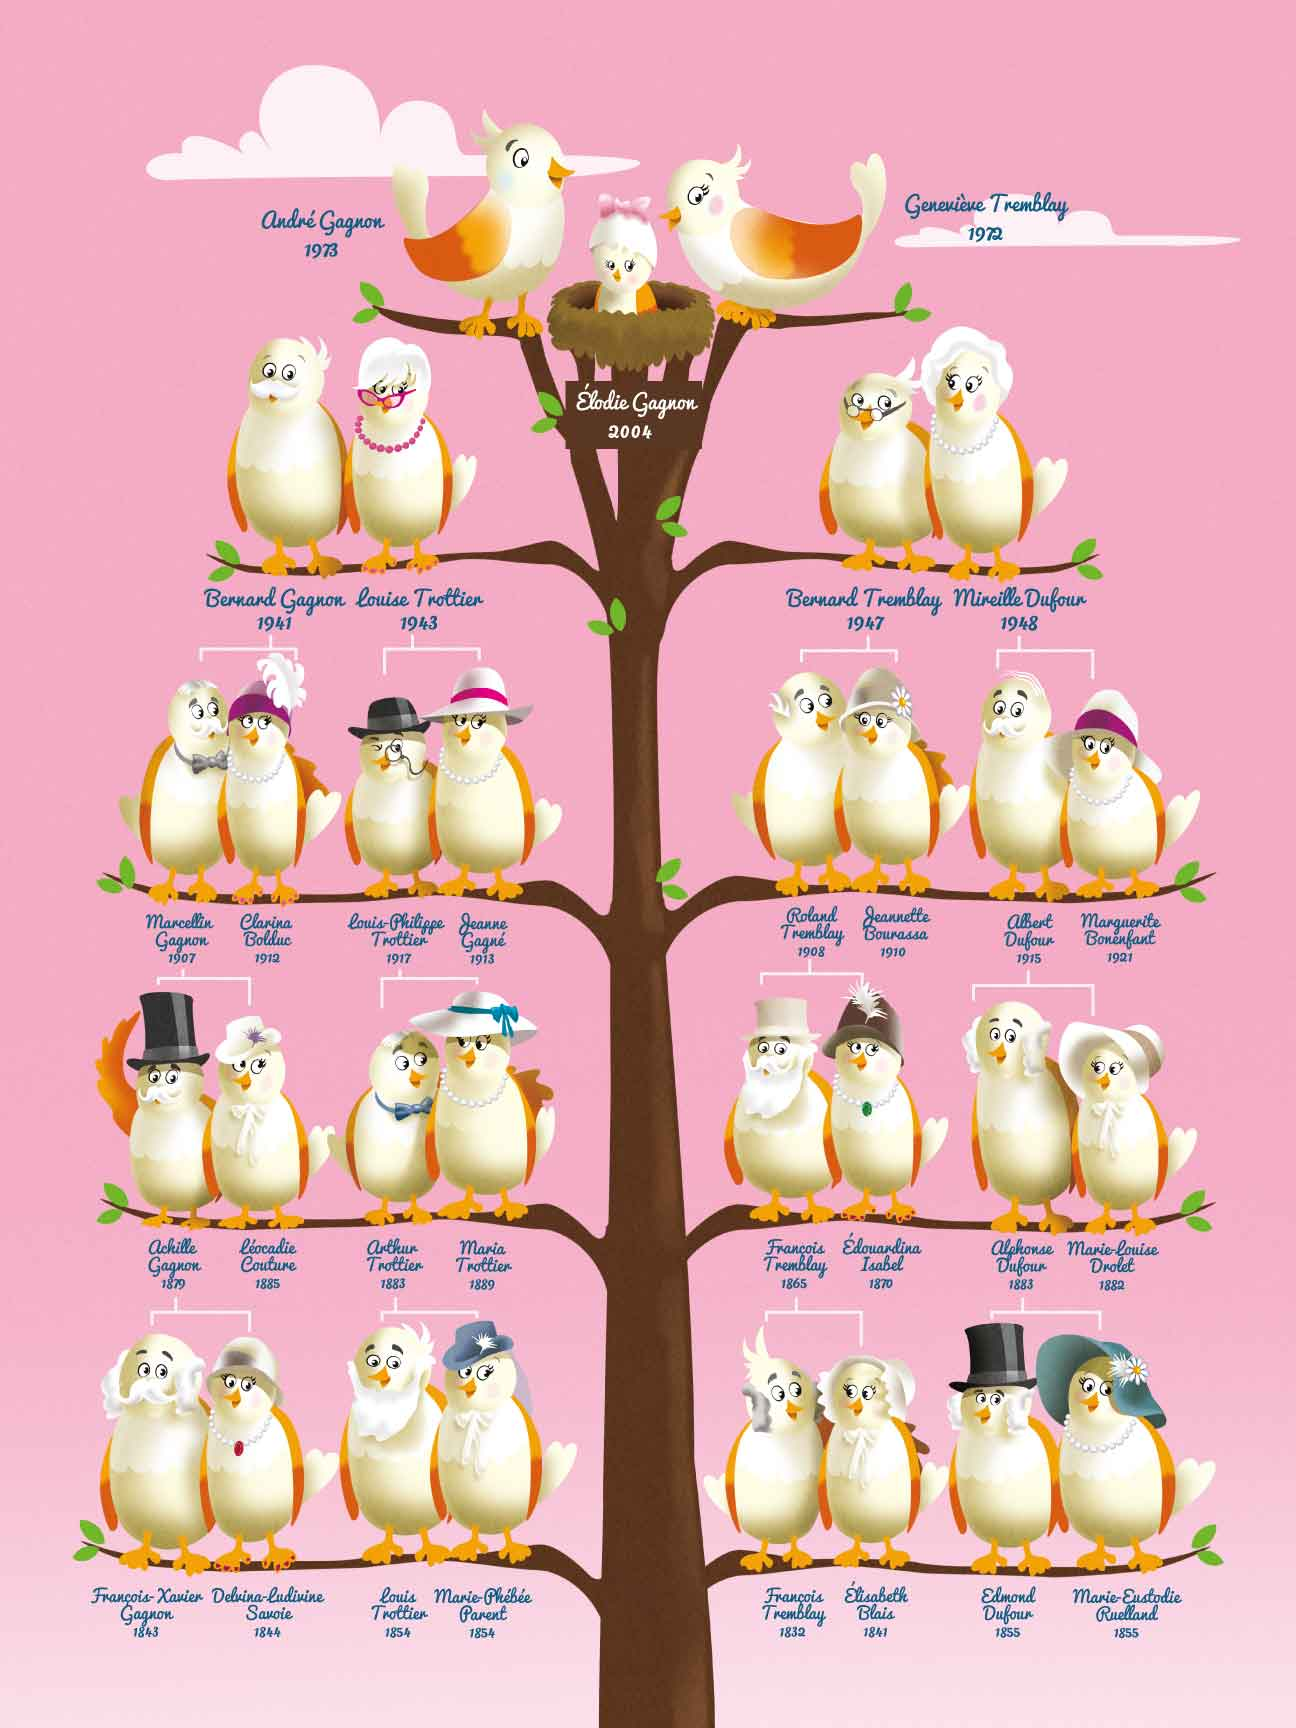 Arbres g n alogiques d coratifs pour enfants id e cadeau qu bec - Idee arbre genealogique original ...